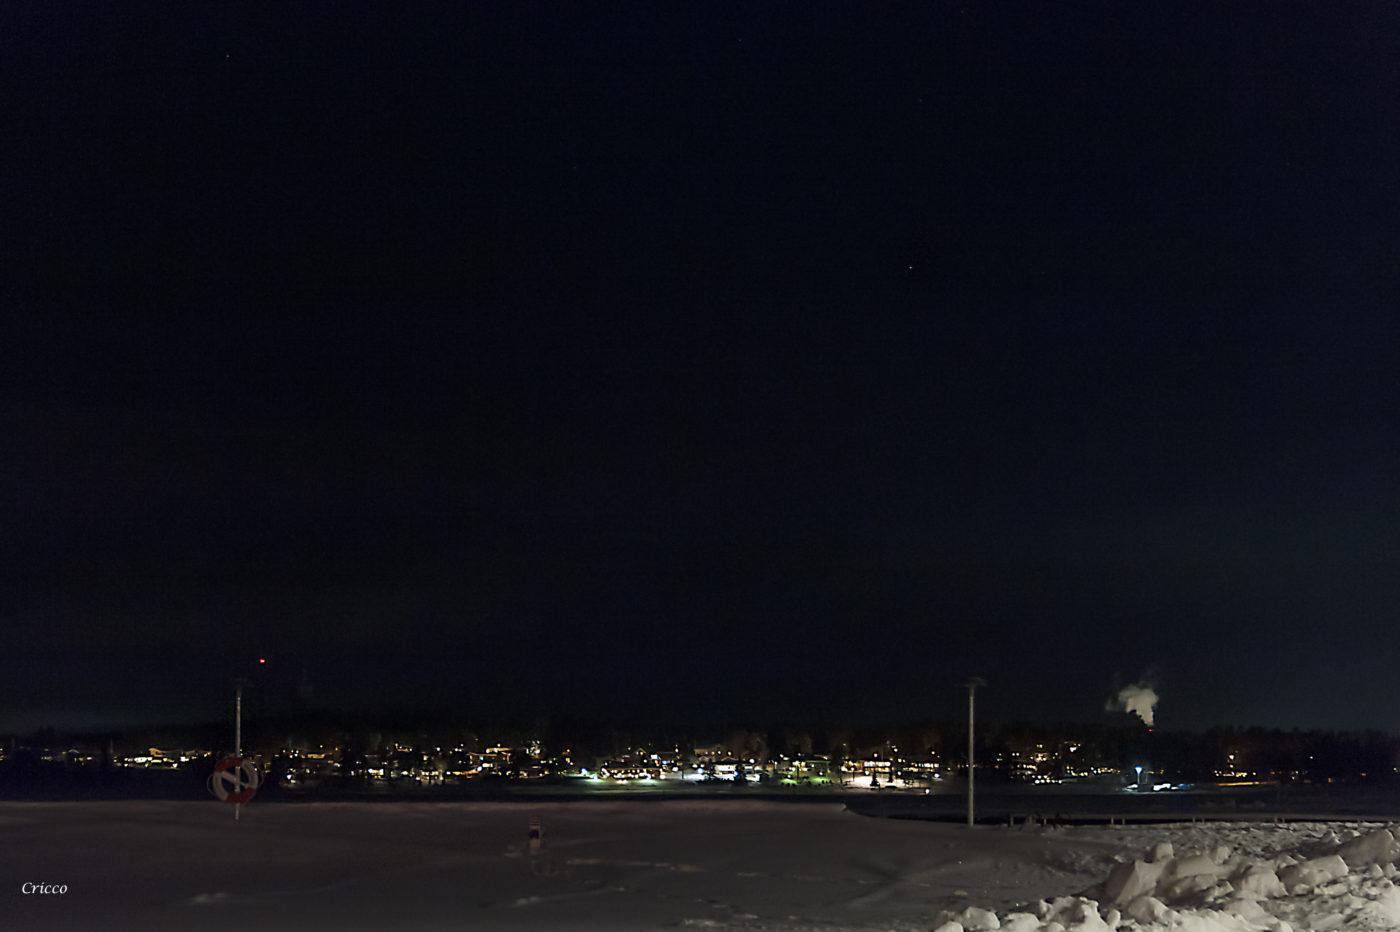 Bergnäset - Cricco